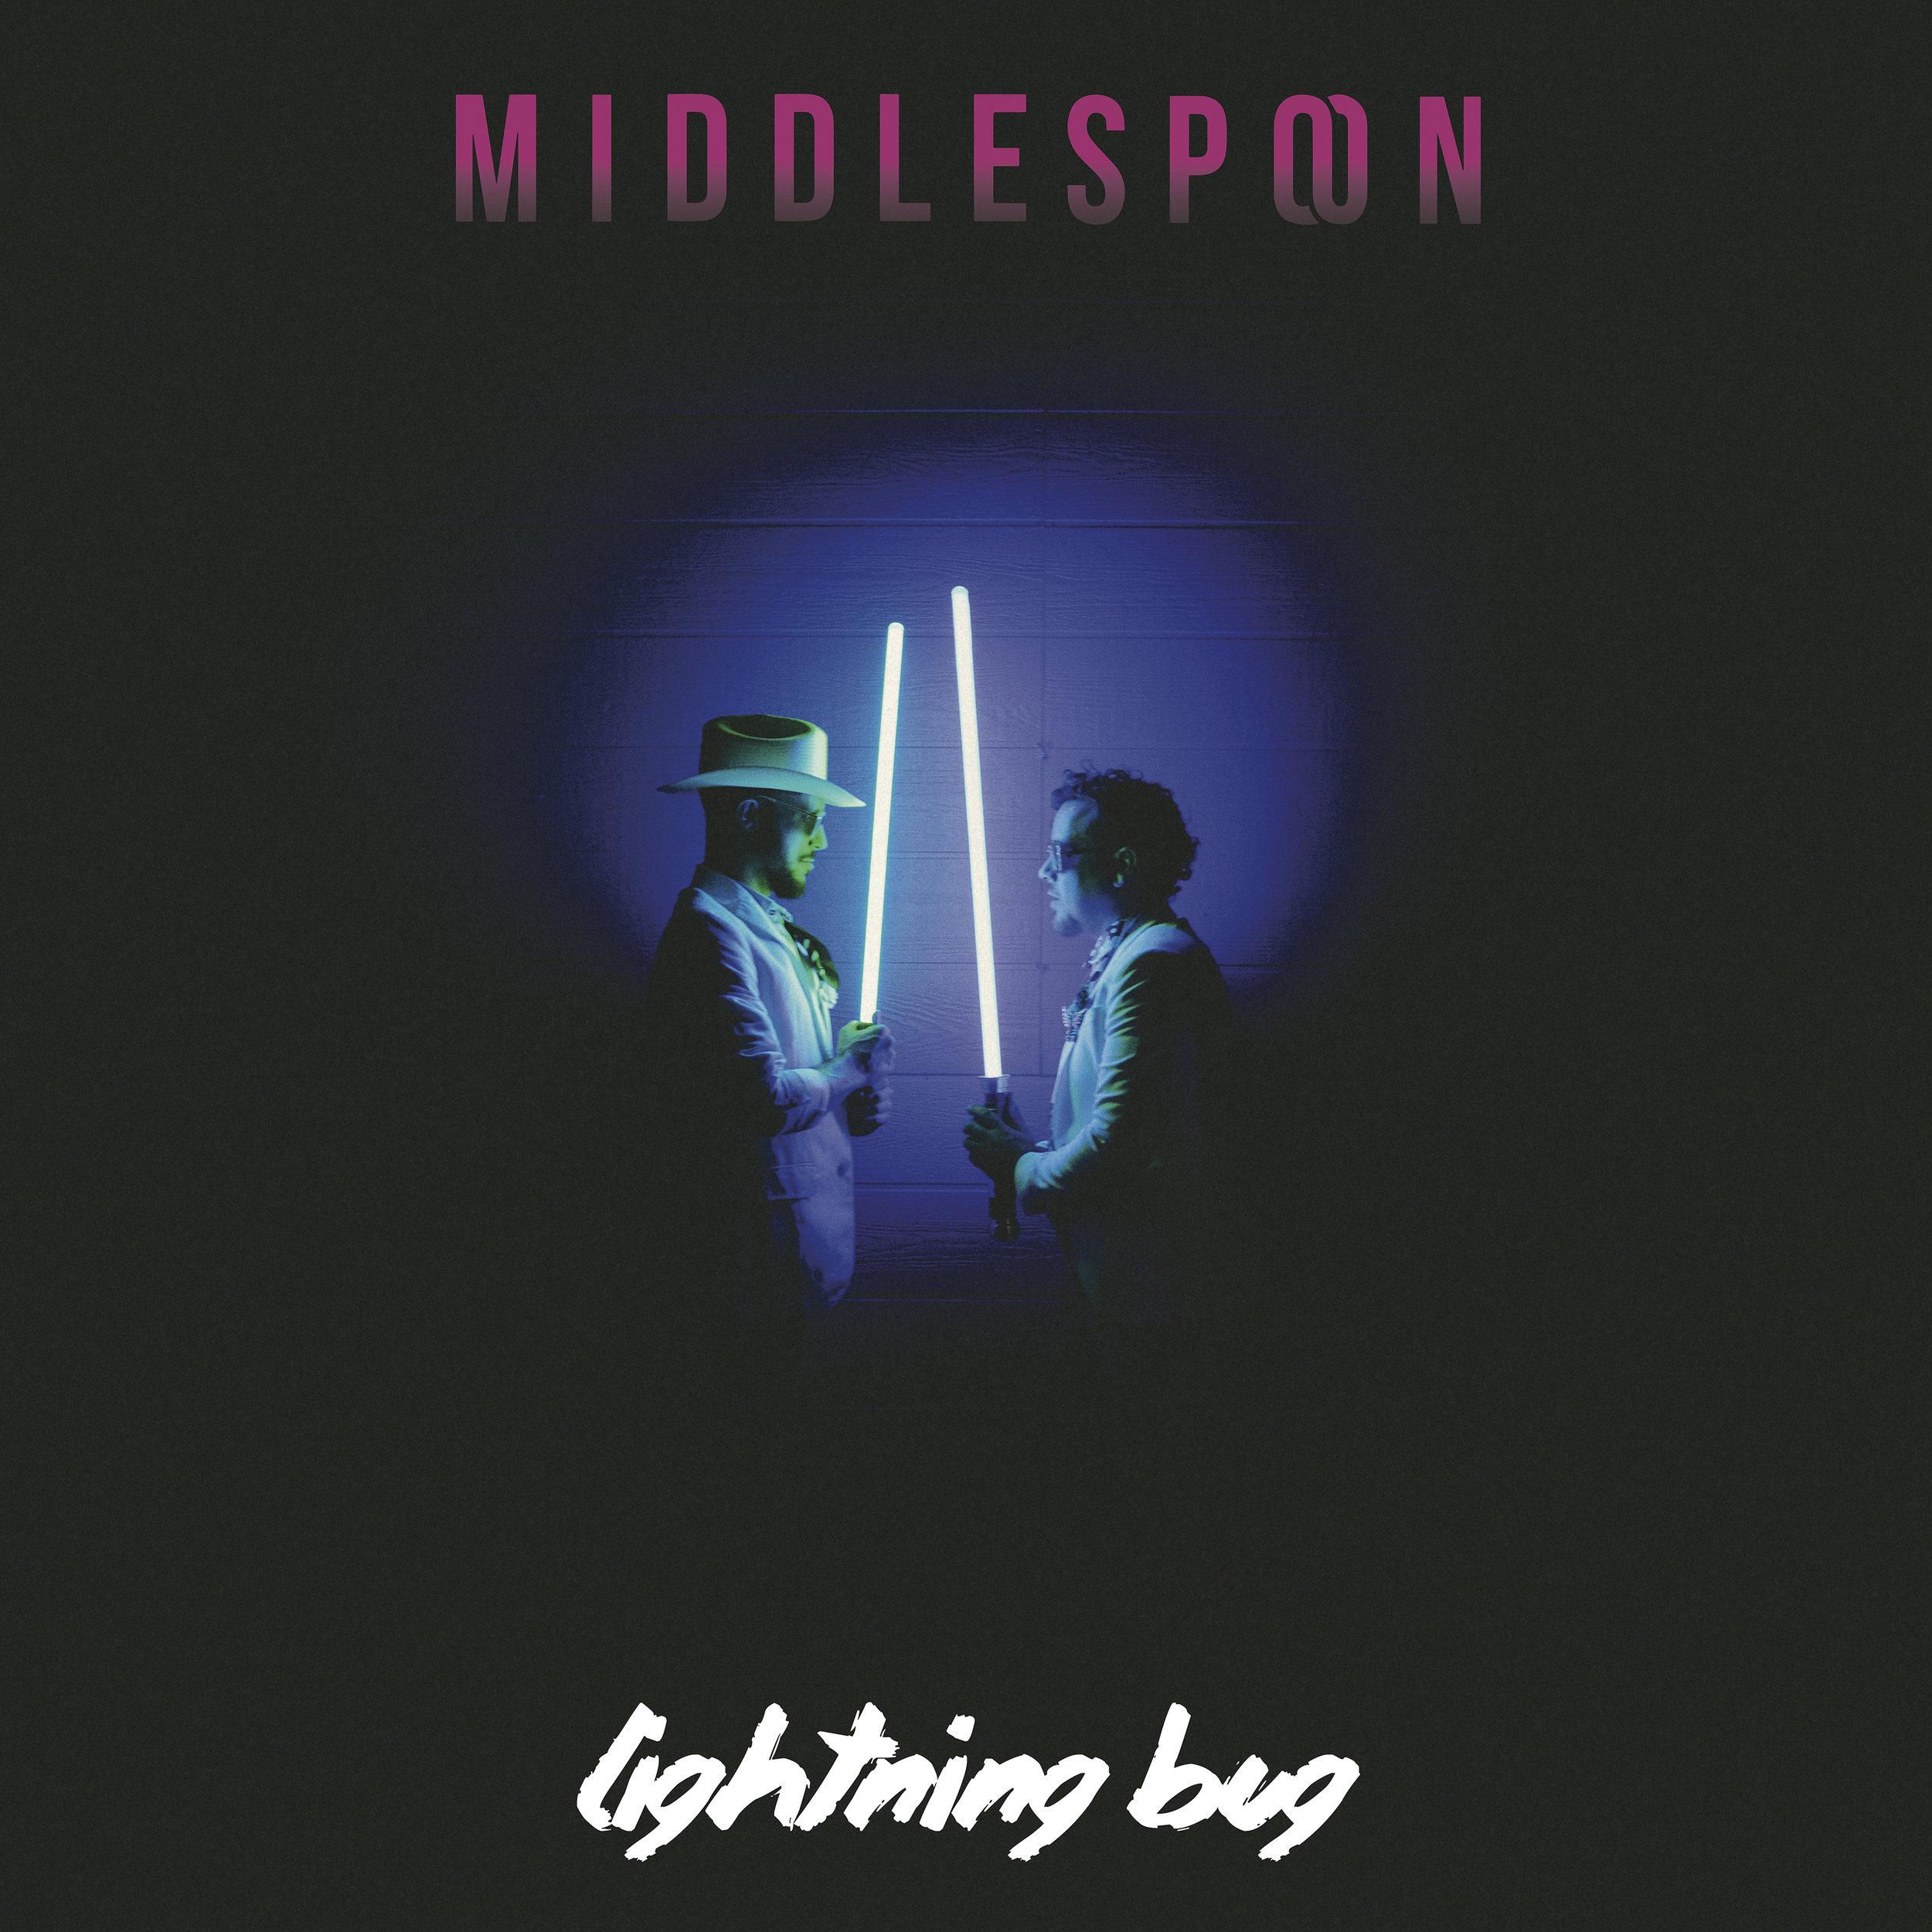 MIDDLESPOON LightningBug Single Artwork 2.jpg